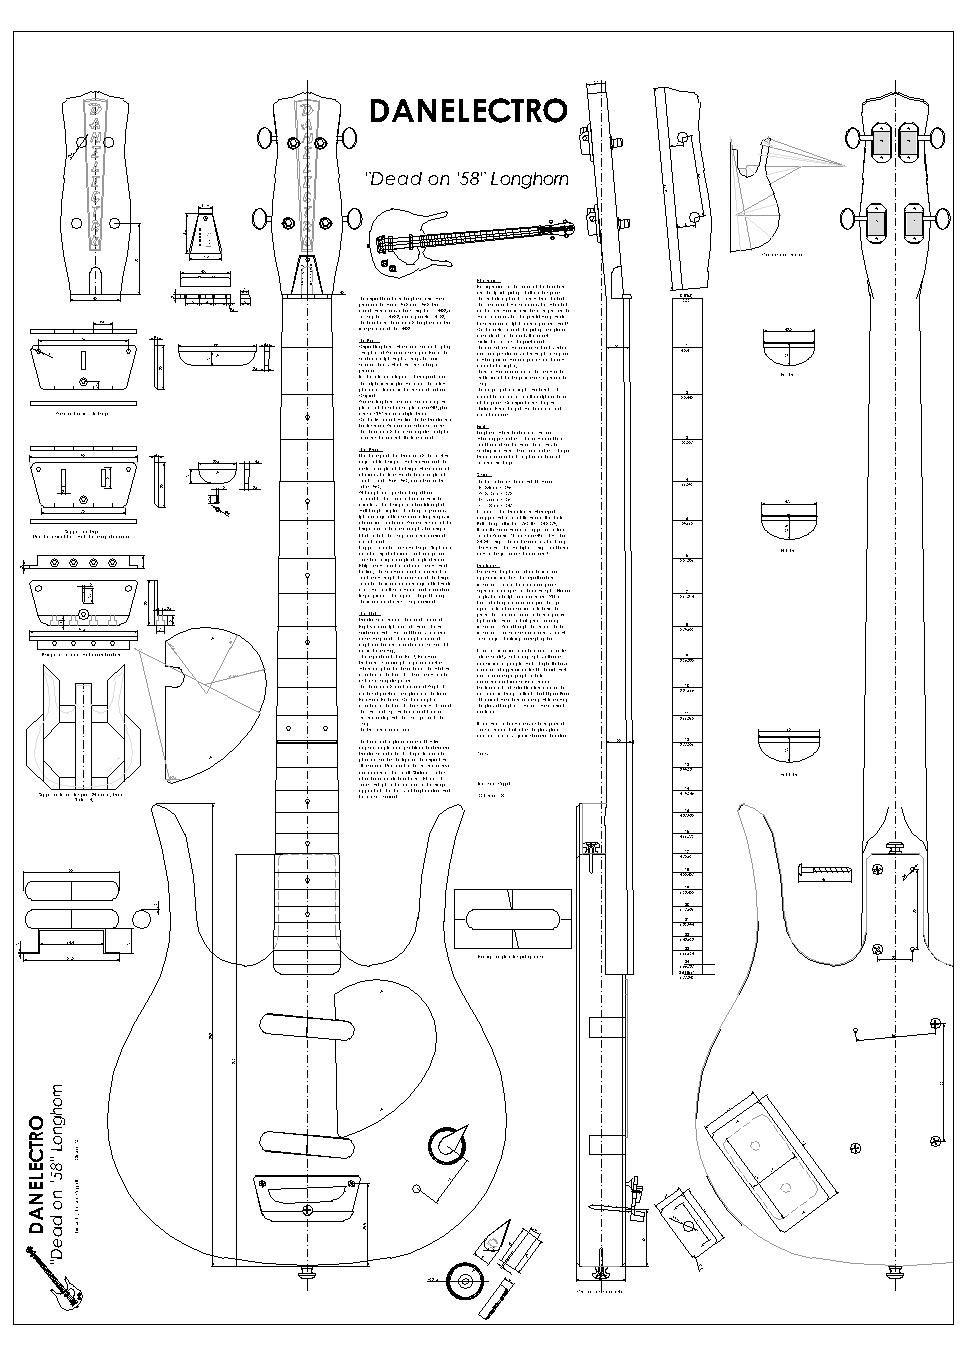 Danelectro Guitar Wiring Detailed Schematic Diagrams Framus Diagram Silvertone 1448 Block And U2022 Volume Pot